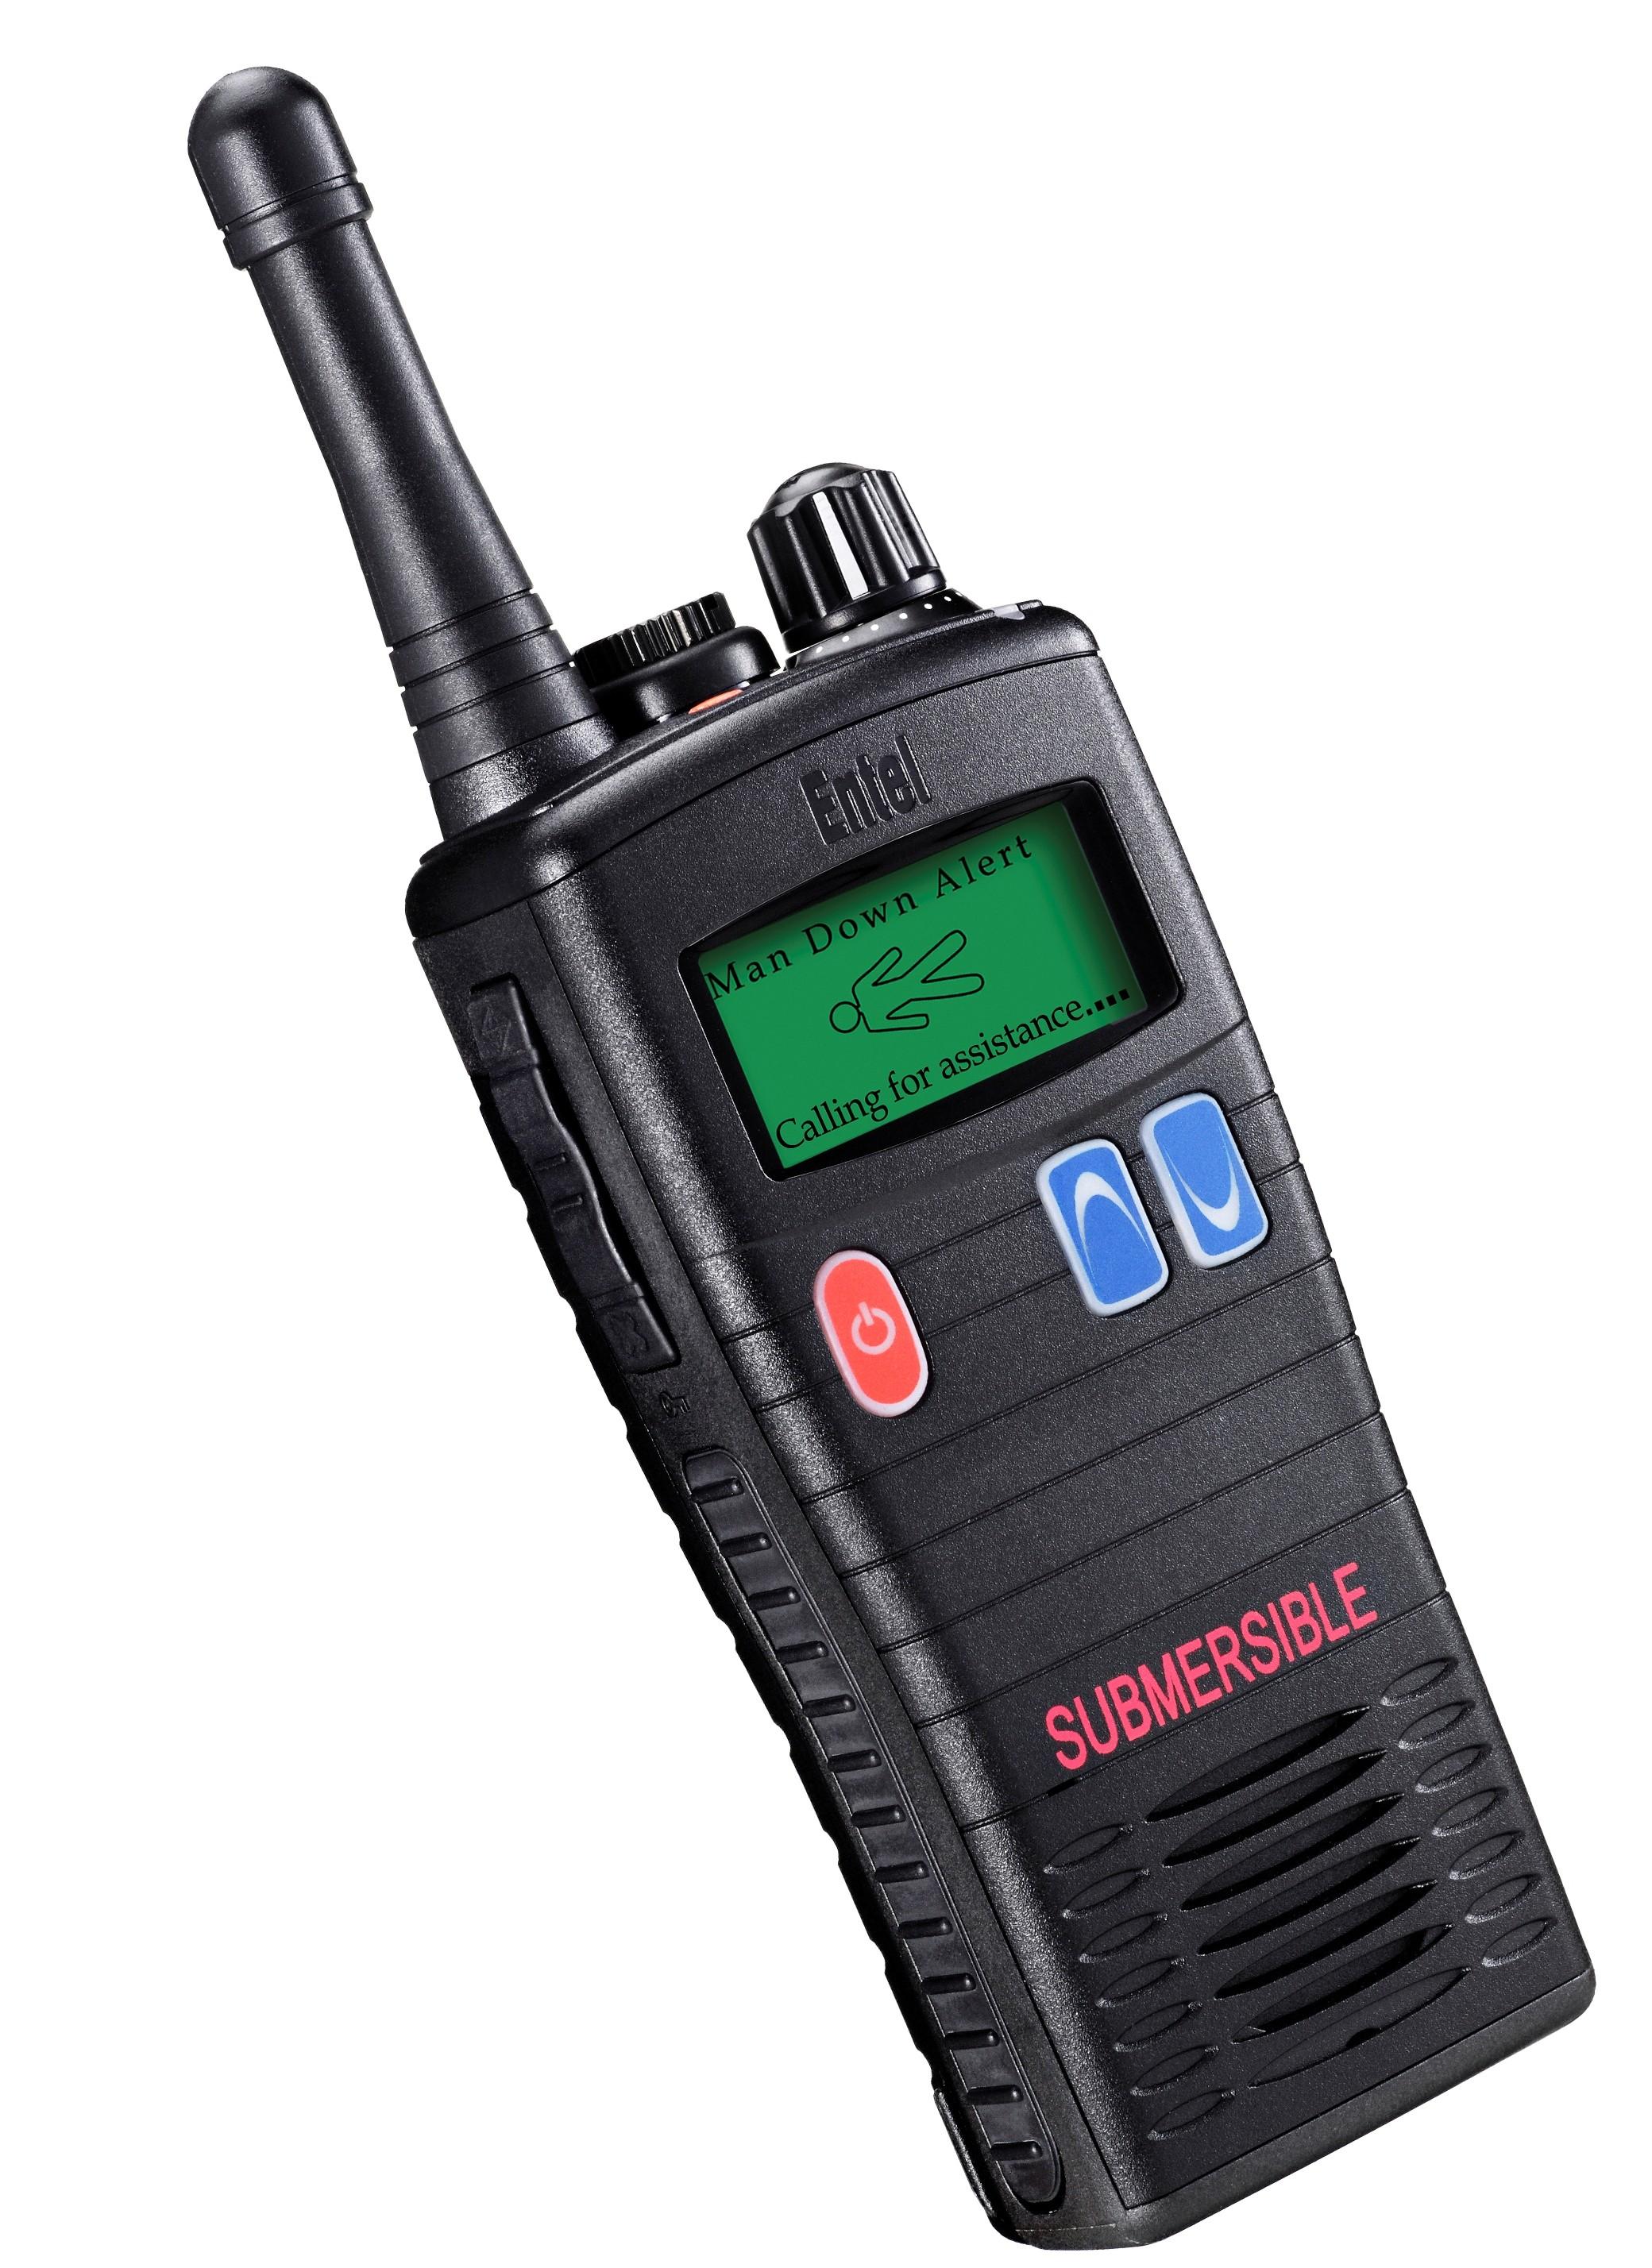 Entel HT983 Two Way Radio